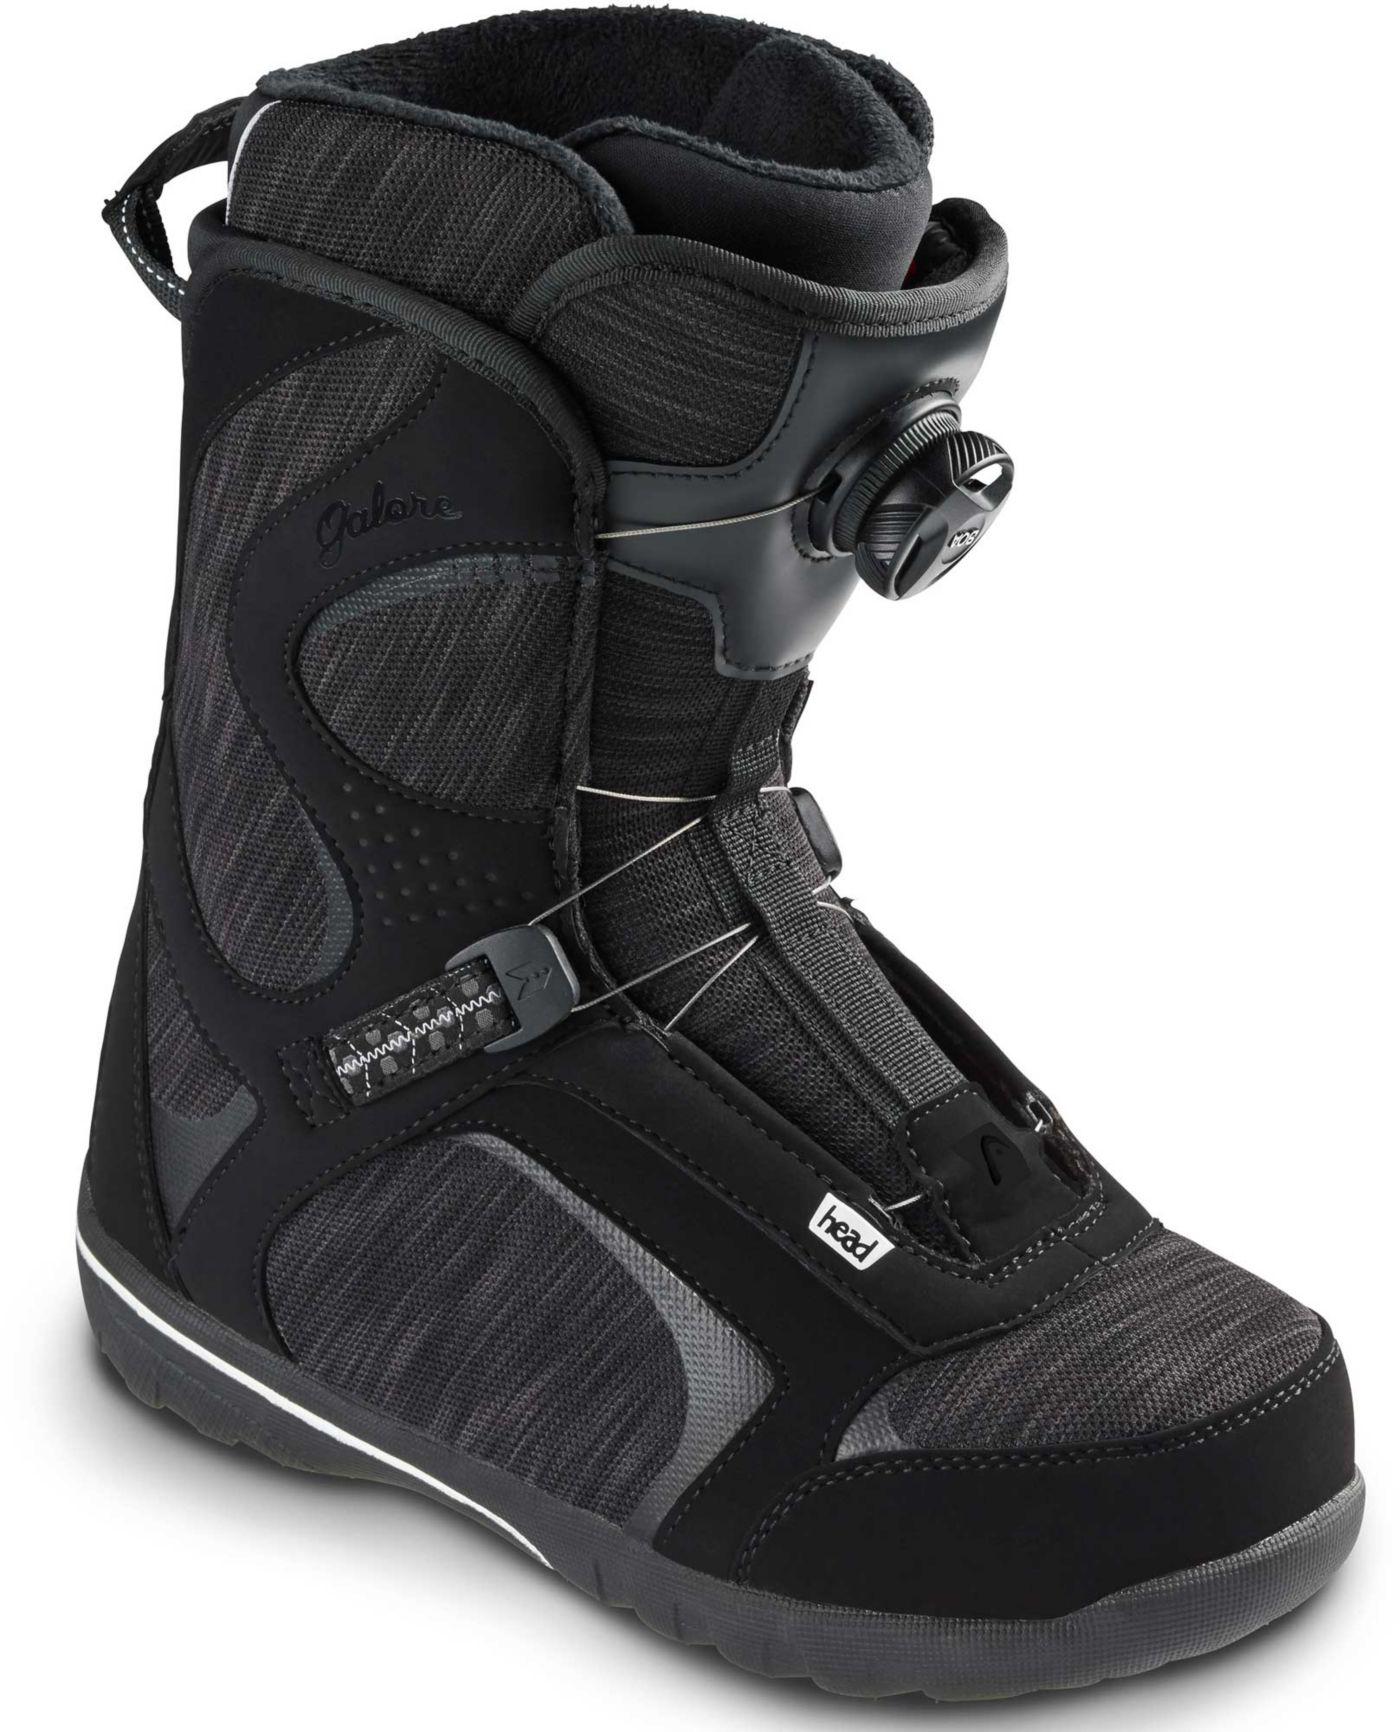 HEAD Women's Galore 2019-2020 Snowboard Boots